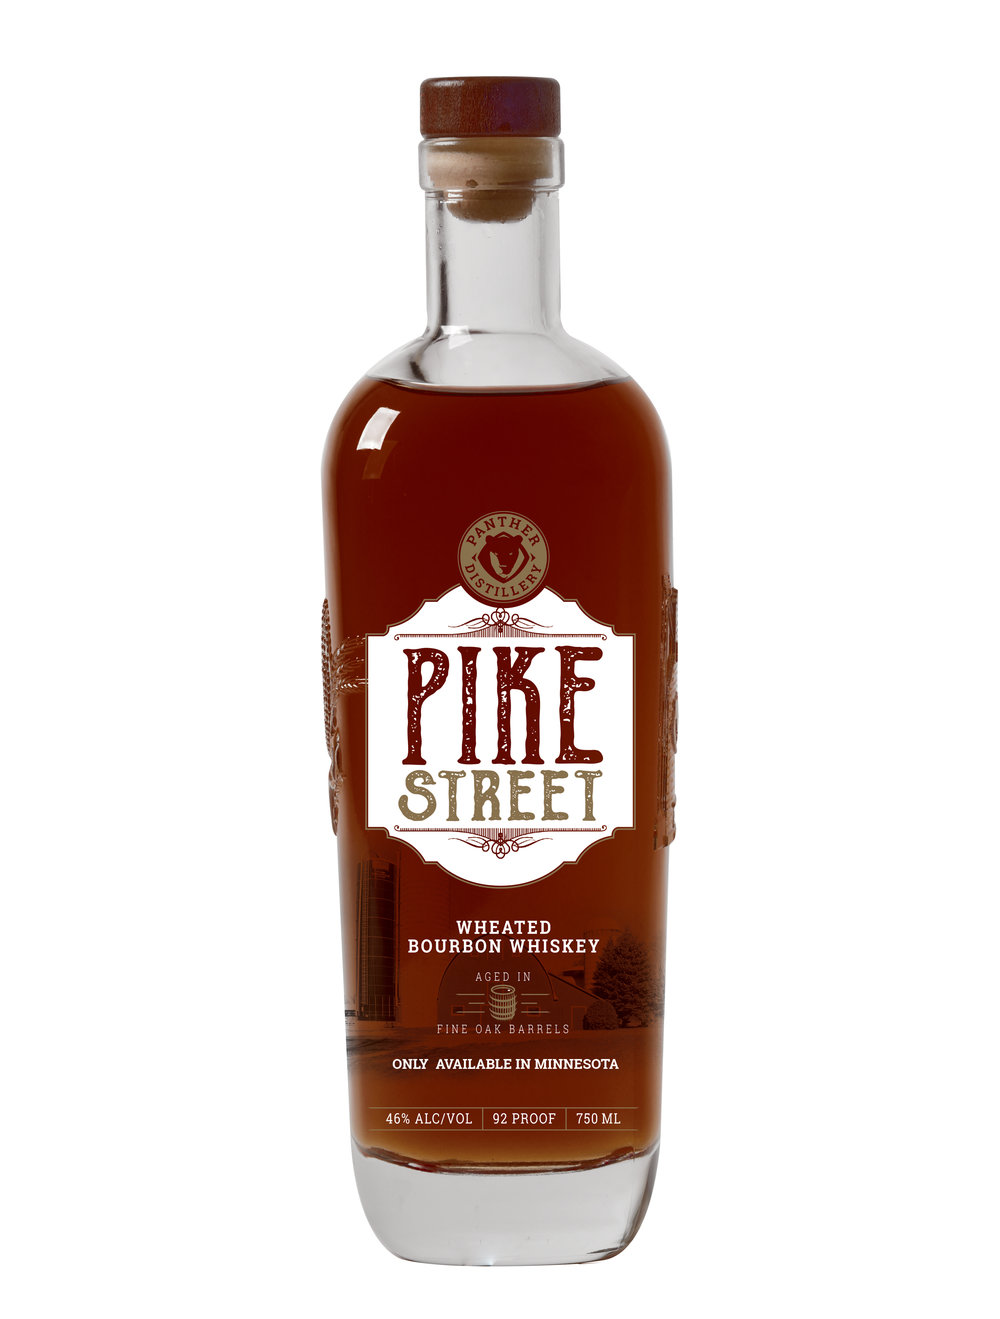 pike street -1_SMALL.jpg